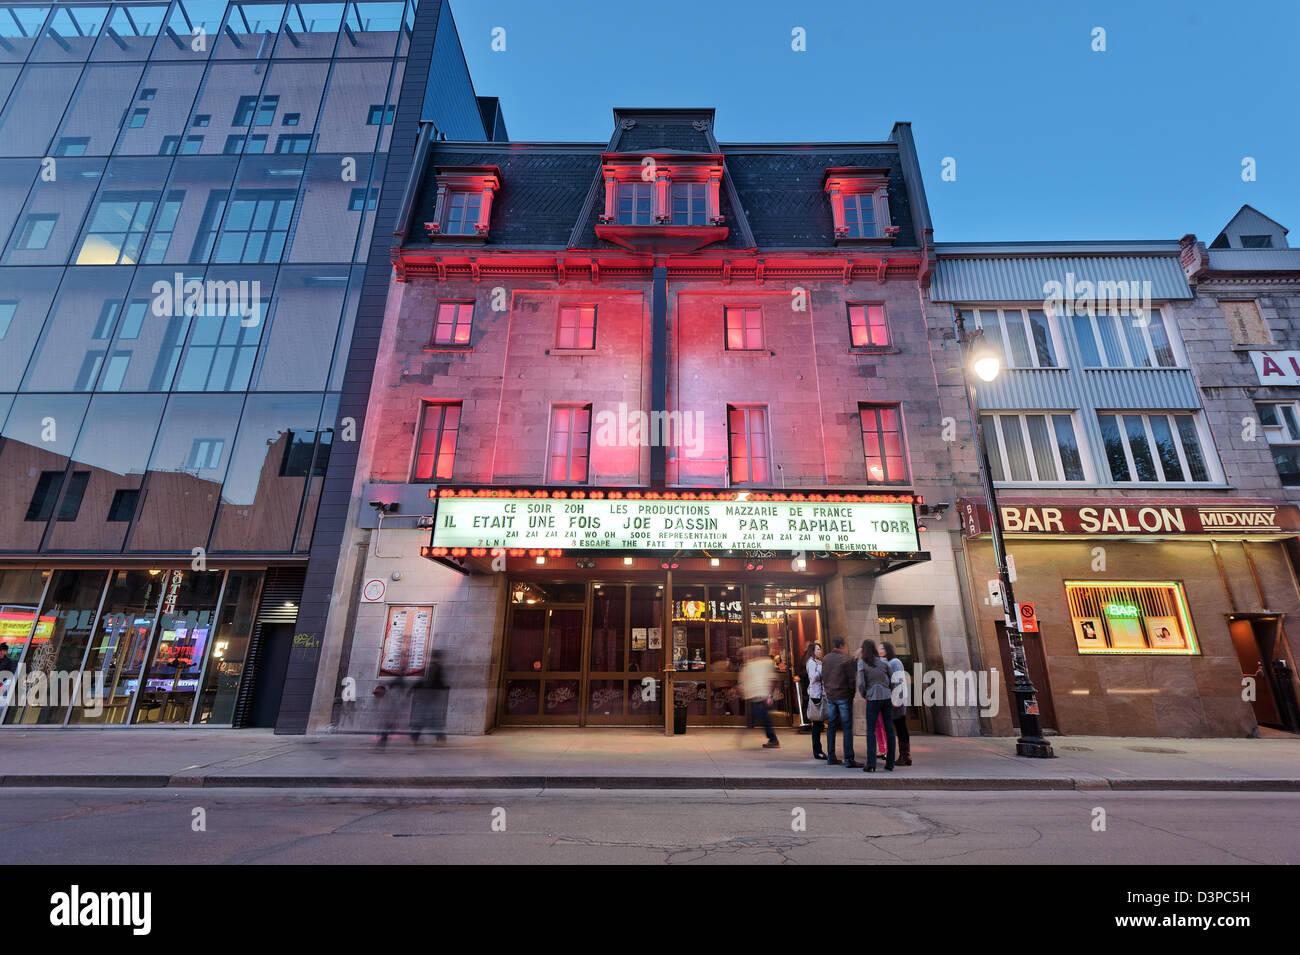 Club Soda, Quartier des Spectacles, Place des Arts, downtown montreal, quebec, Canada - Stock Image